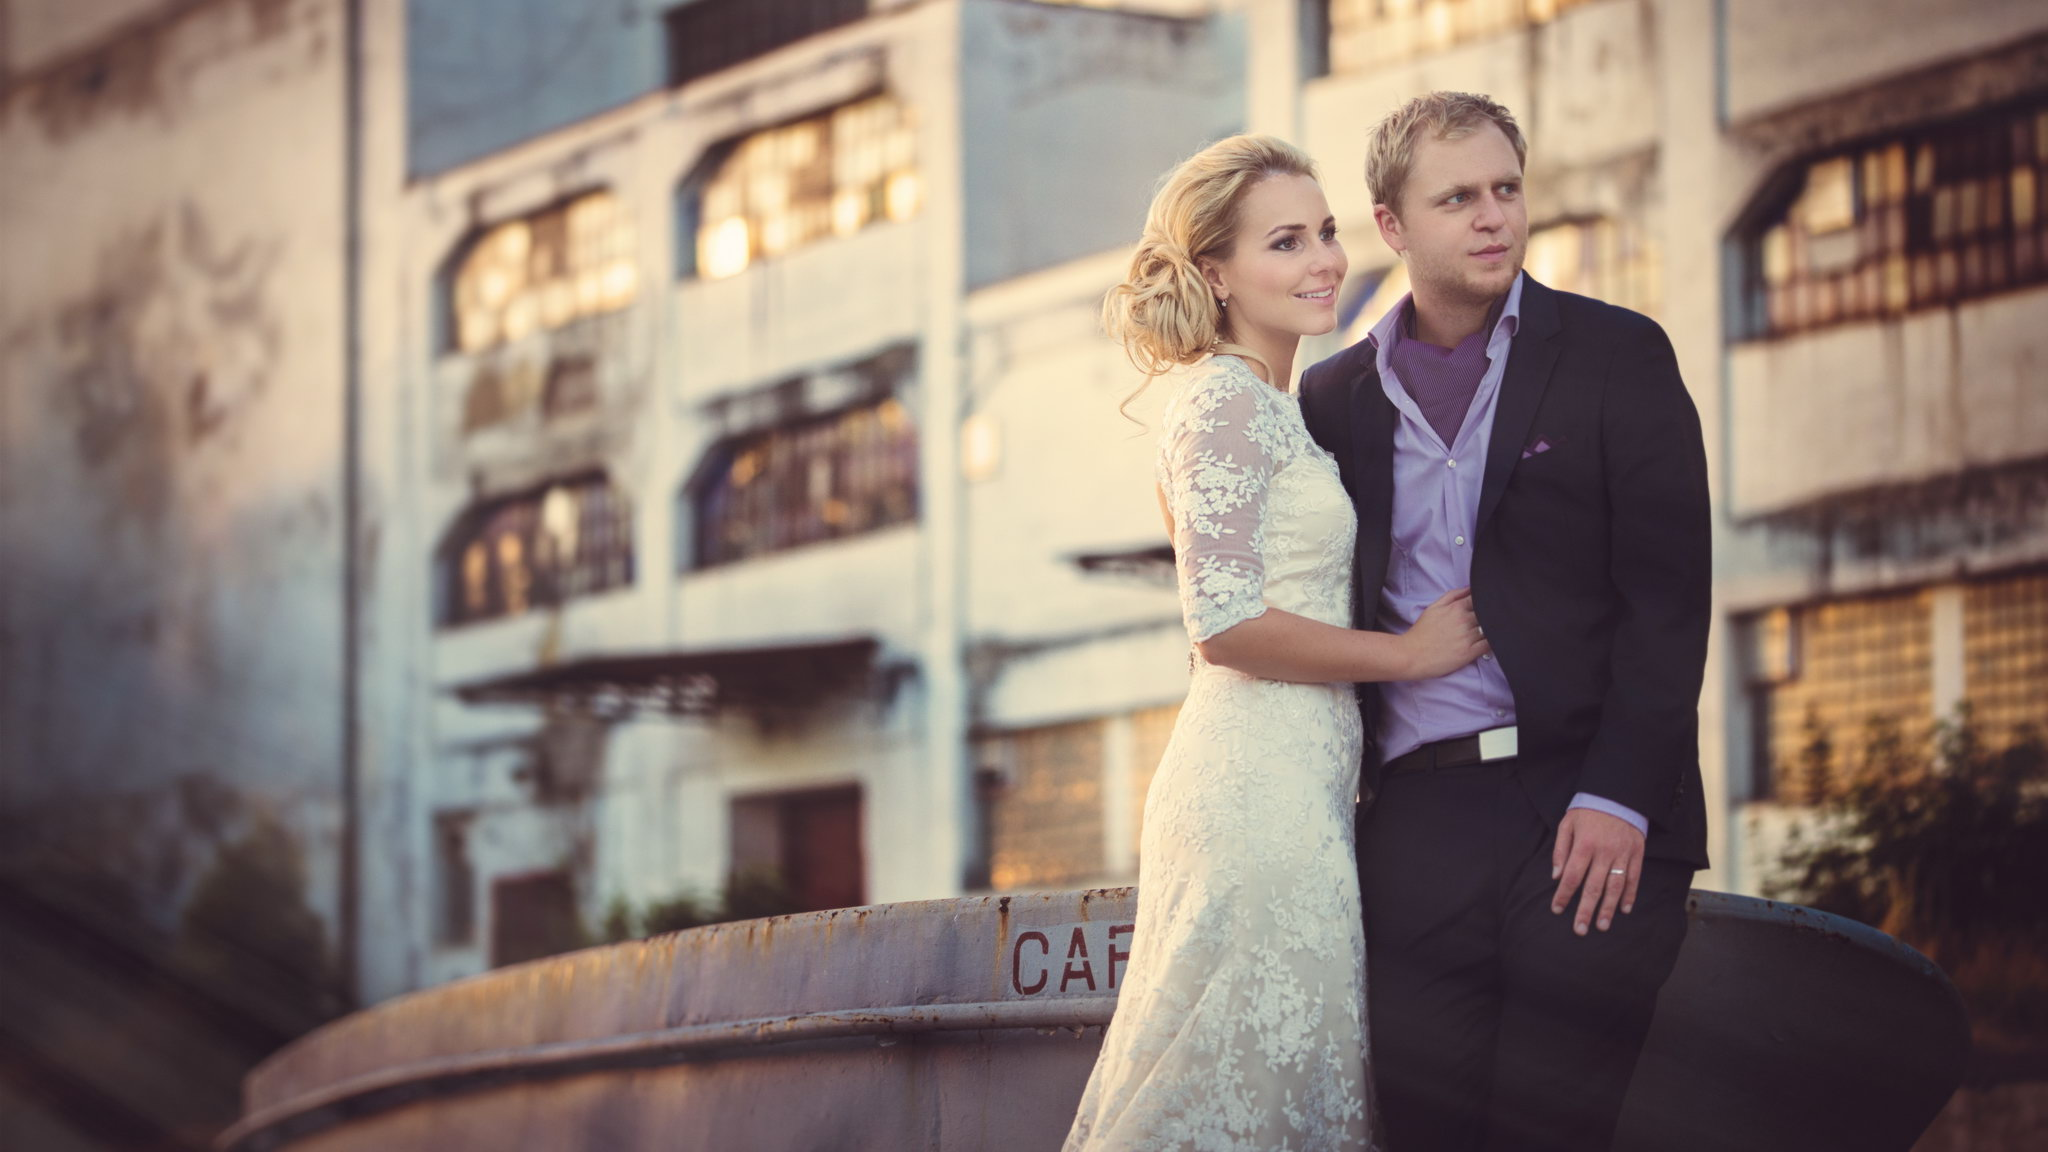 Lucie & Petr wedding